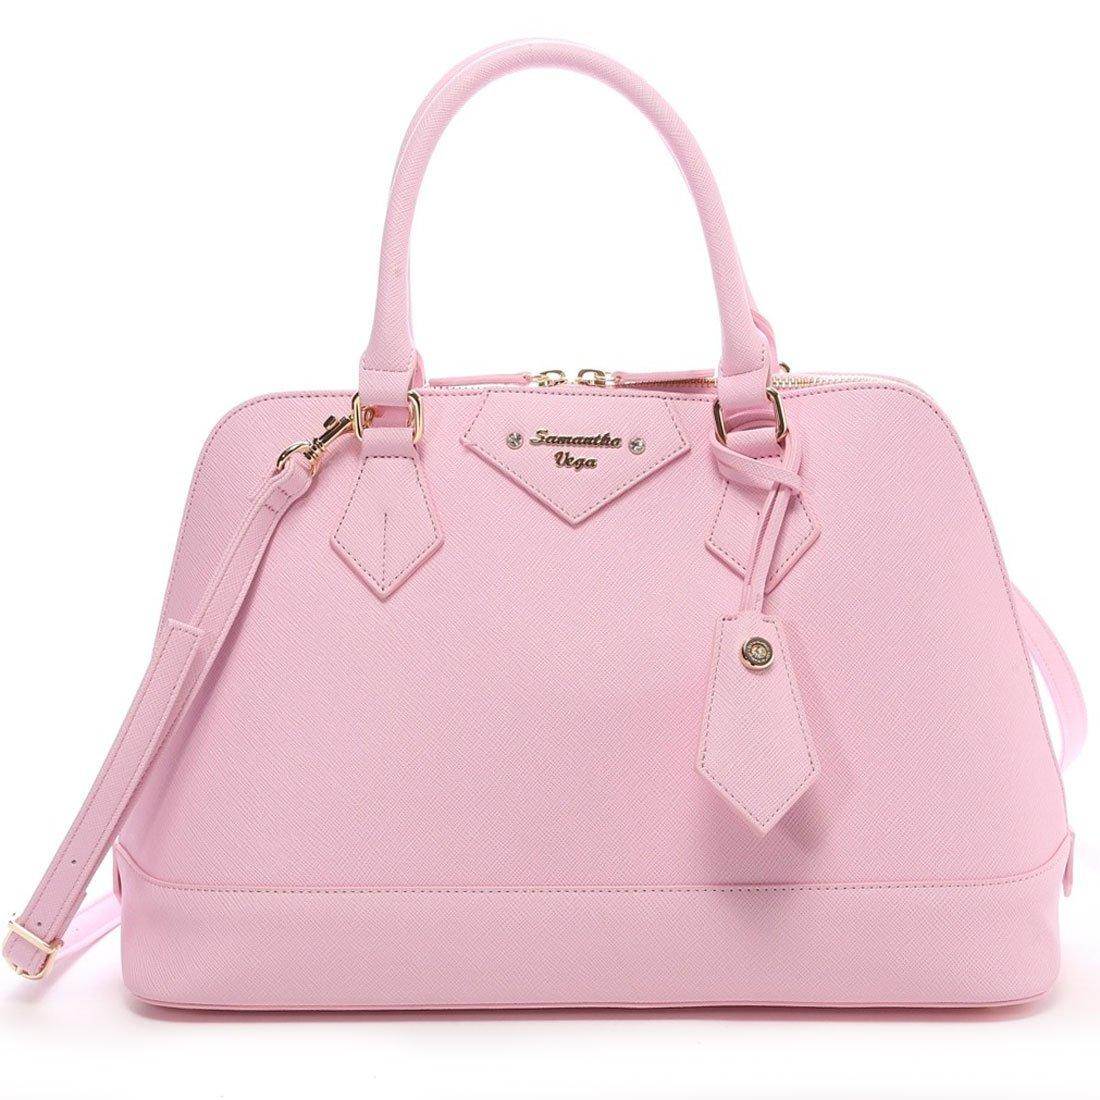 Samantha Vega Lady Azel Hand bag,Shoulder Baby pink Large B5 Thavasa Japan NEW